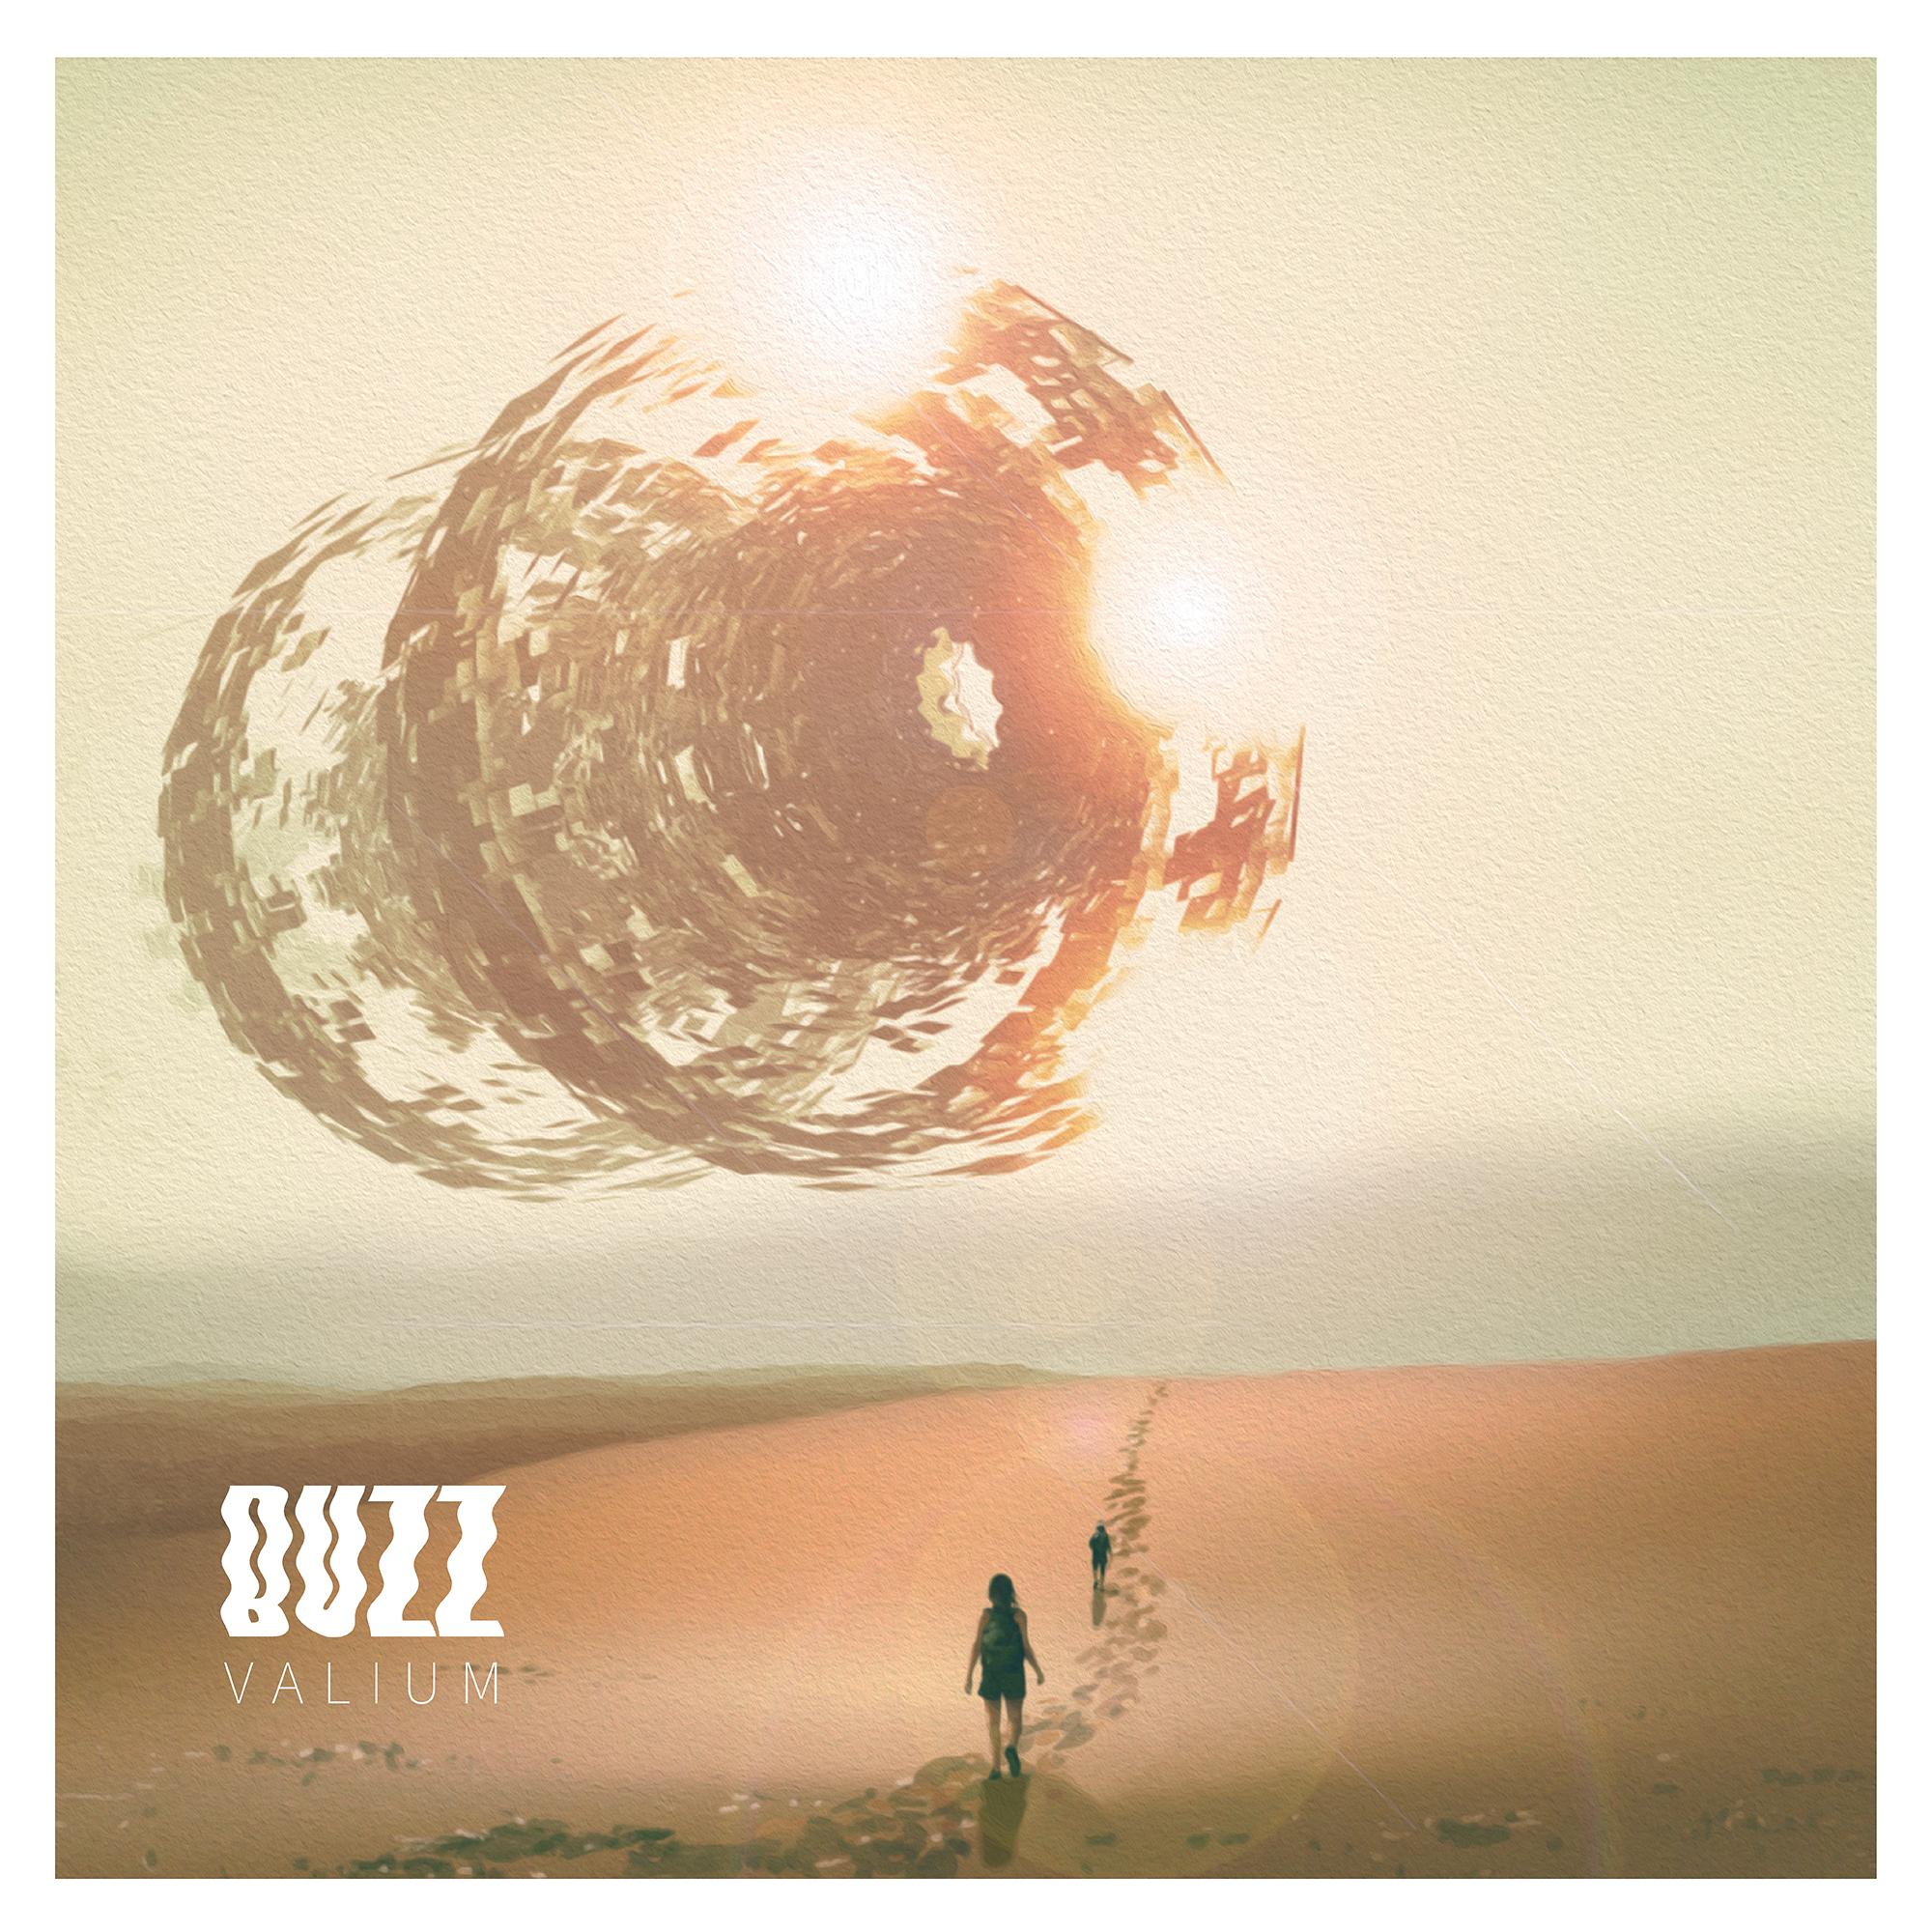 buzz_valium_ep_cover-_med.jpg